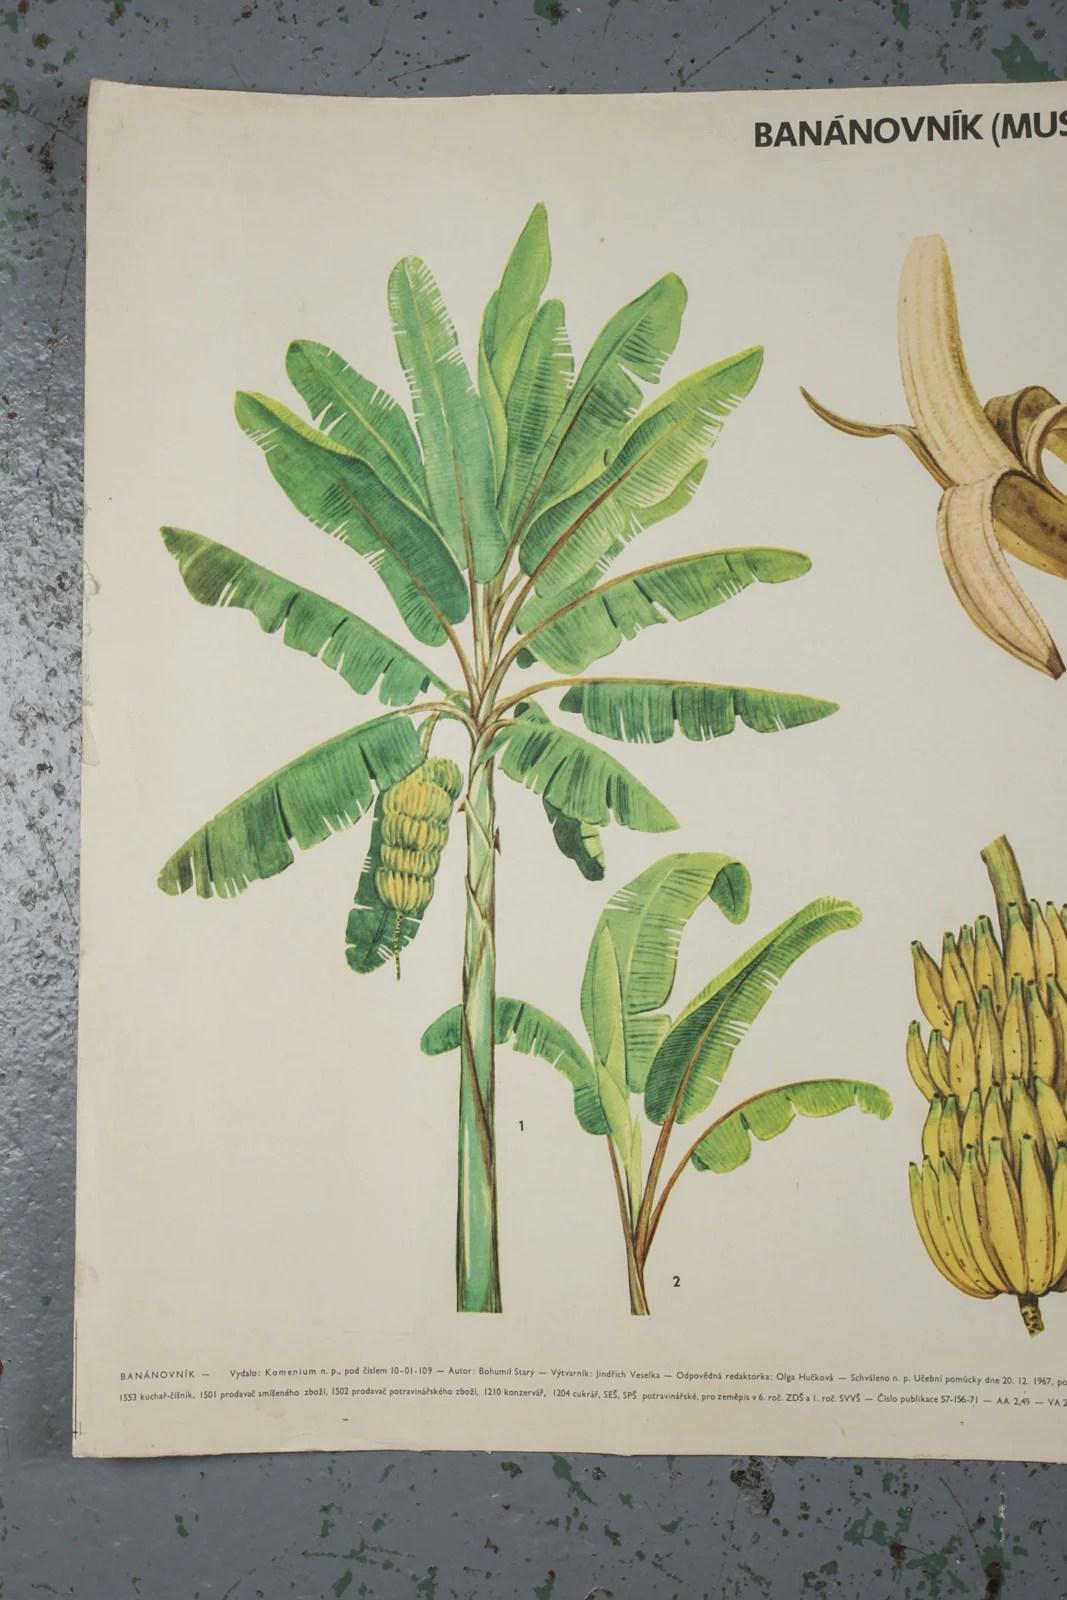 Botanical Banana Educational Poster 1972